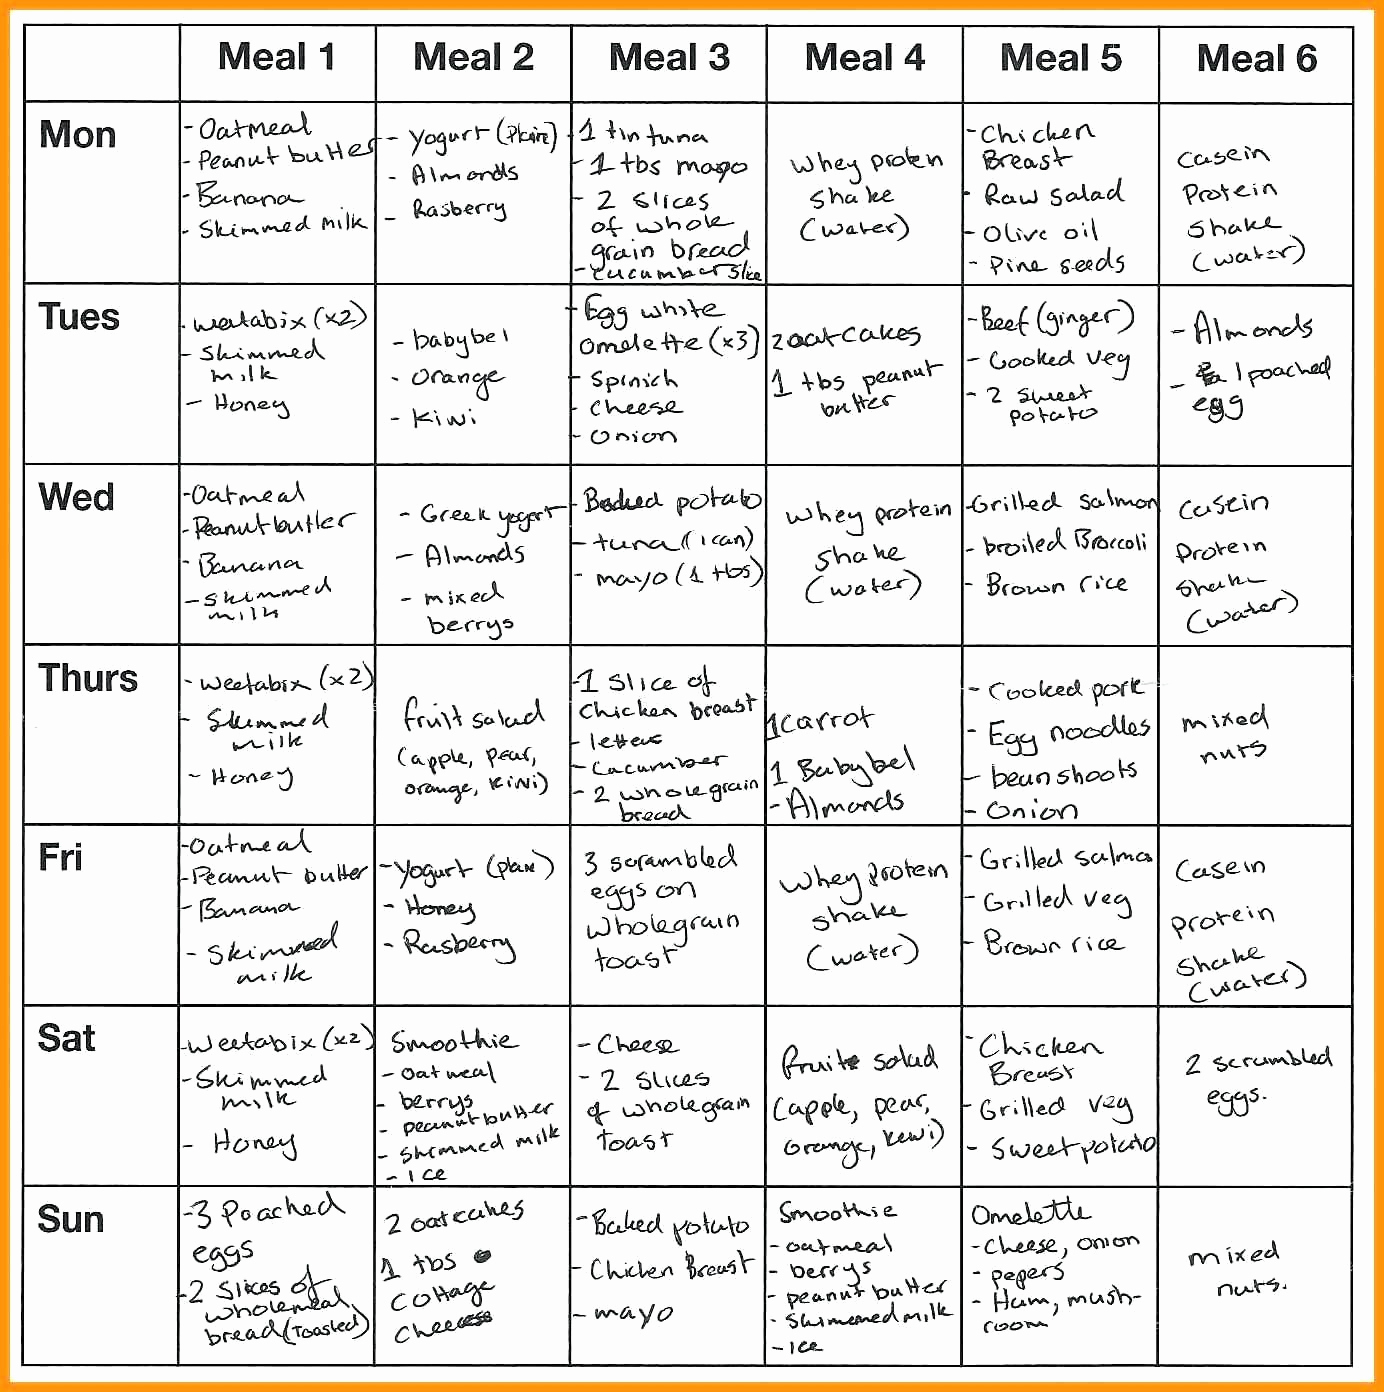 Sweet 16 Budget Spreadsheet Inside Pearbudget Spreadsheet As Budget Spreadsheet Excel Spreadsheet App